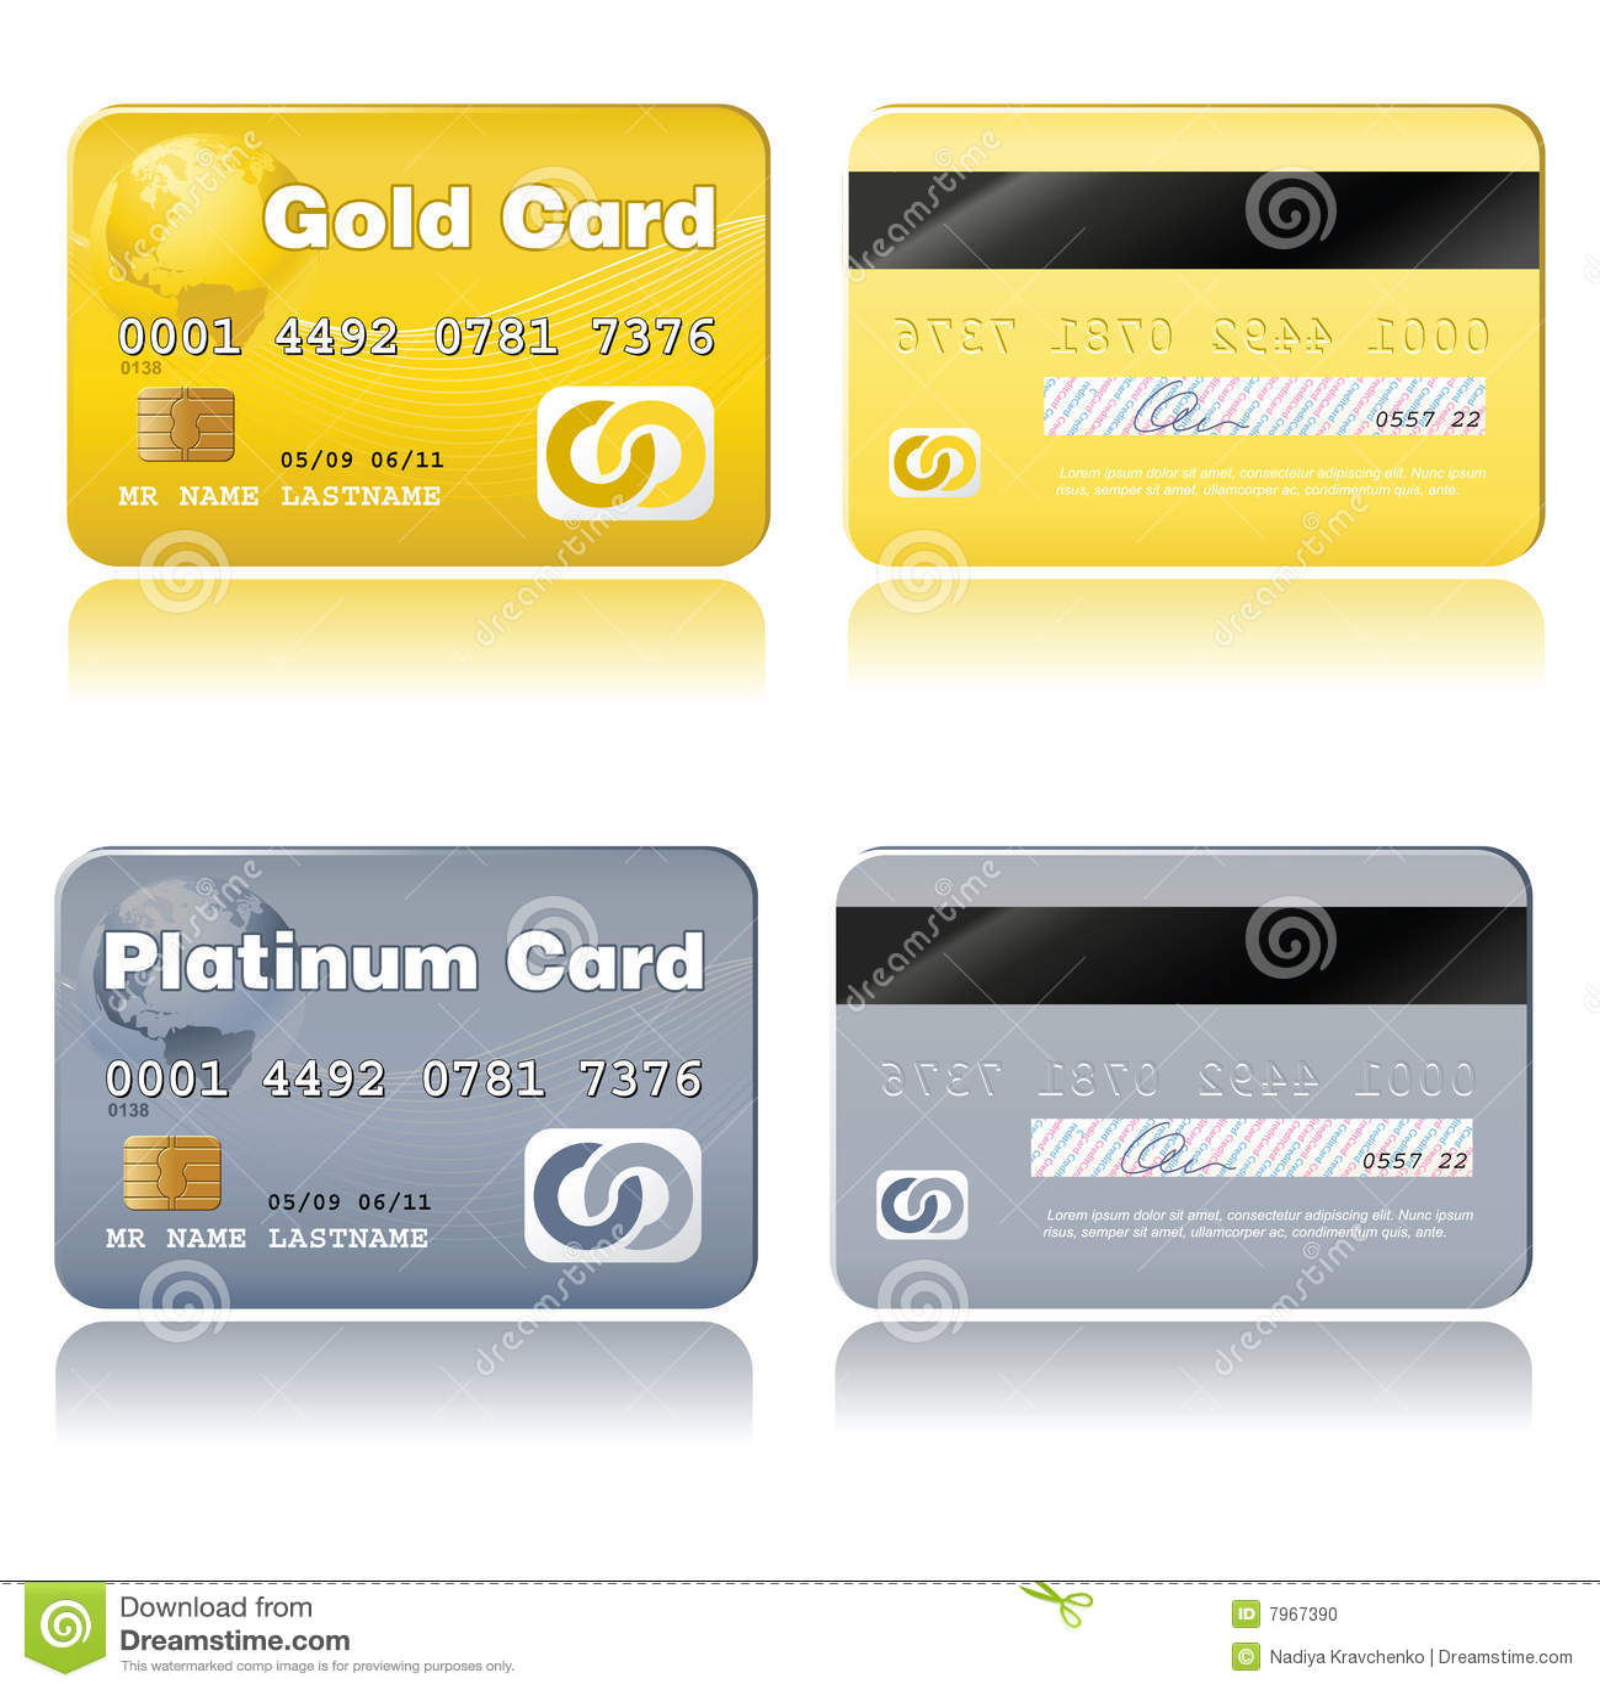 48d6ad881eb6e Vip cards stock vector. Illustration of plastic